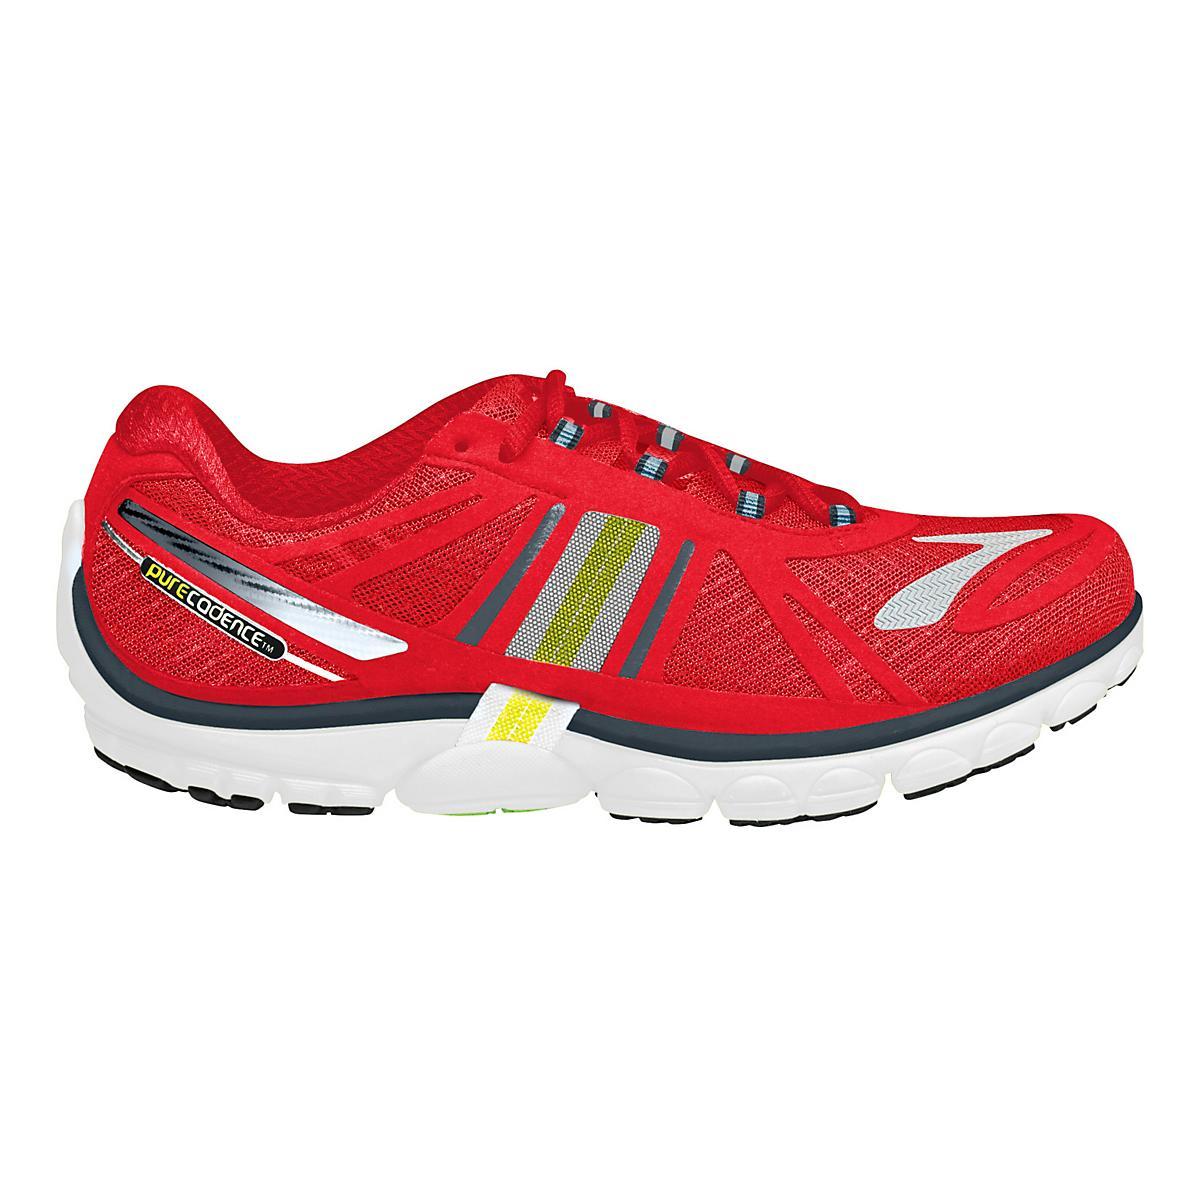 c9242beceb0 Mens Brooks PureCadence 2 Running Shoe at Road Runner Sports